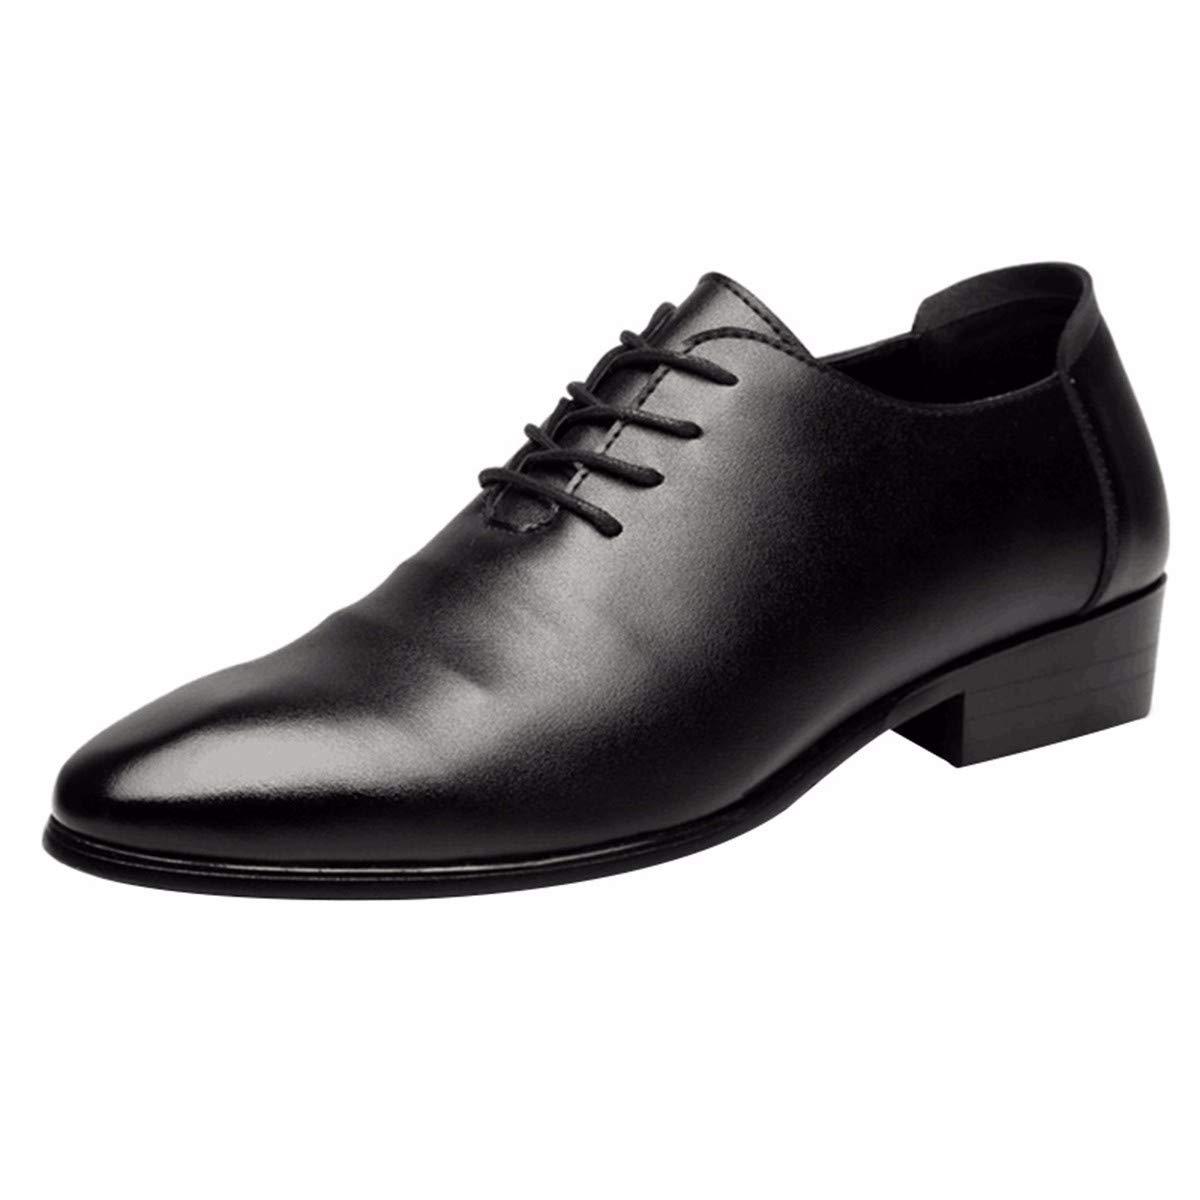 KMJBS Herren Schuhe im Sommer, Lederschuhe, modisch, atmungsaktiv, mit Schnürung im Inneren.